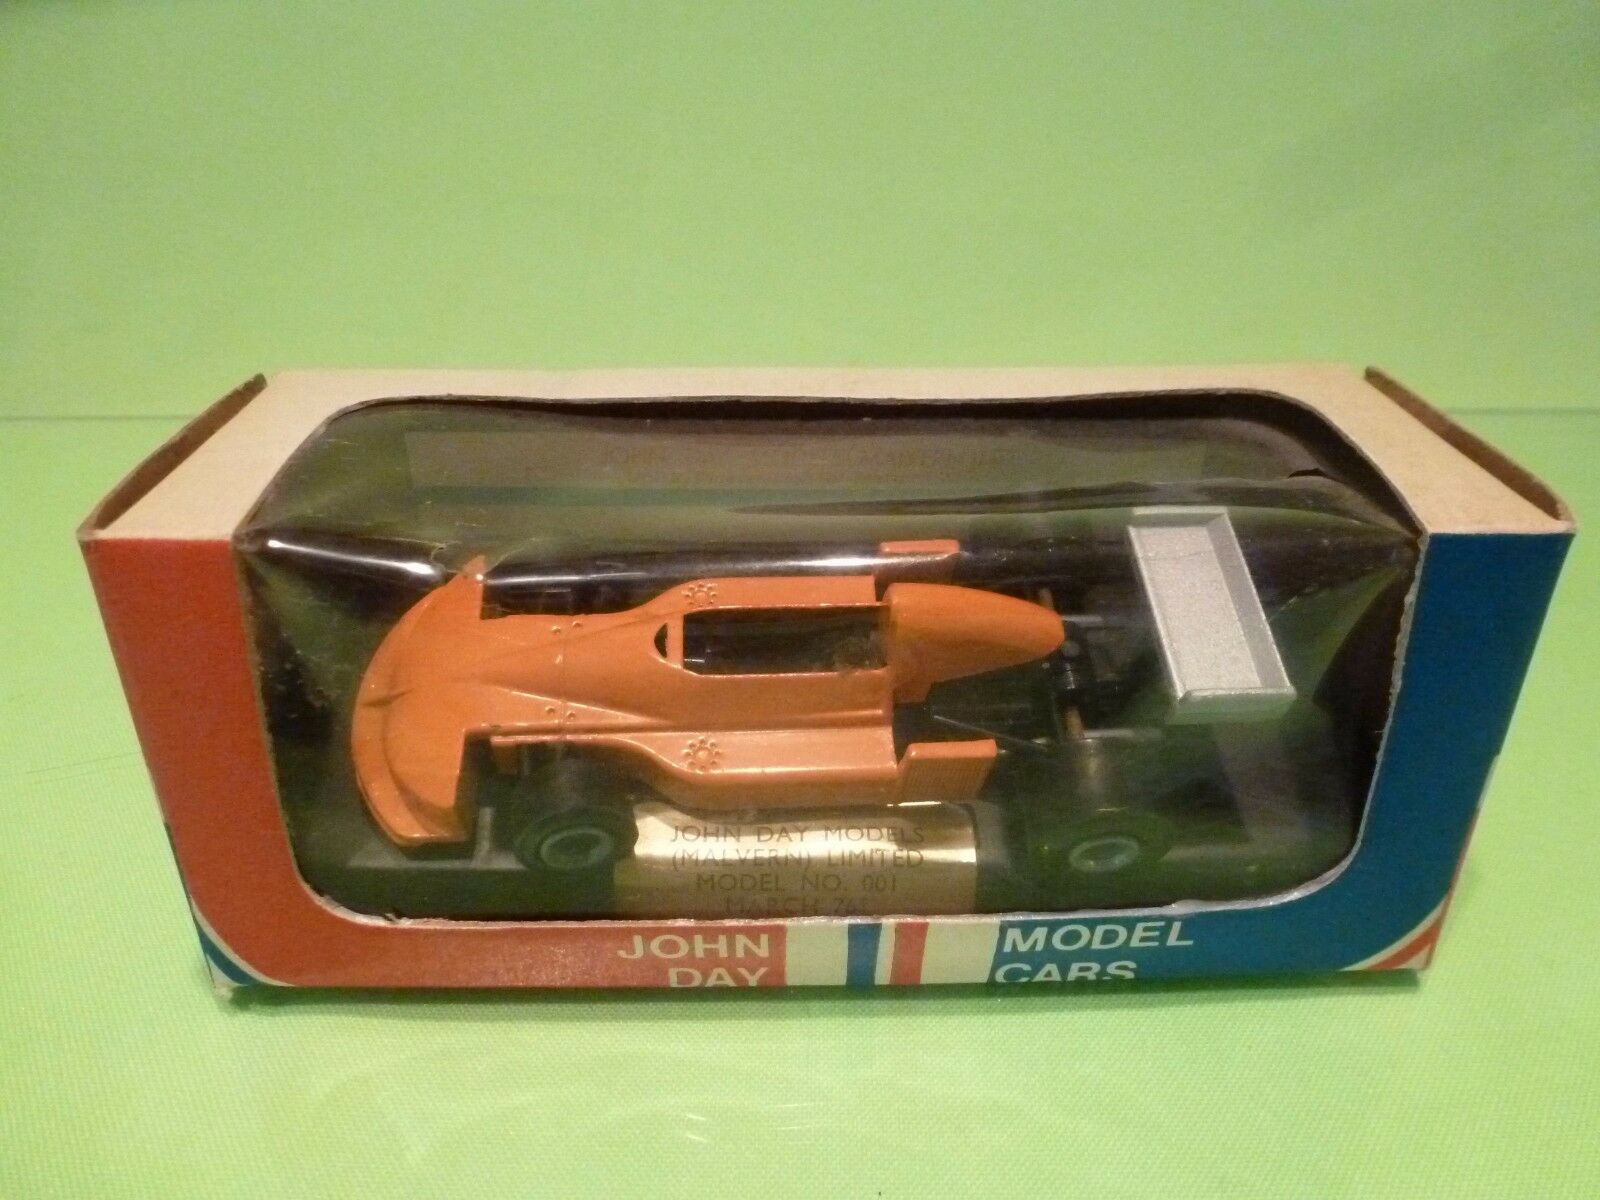 JOHN DAY MODELS 001 MARCH 761- VITTORIO BRAMBILLA - F1 orange 1 43 - GOOD IN BOX